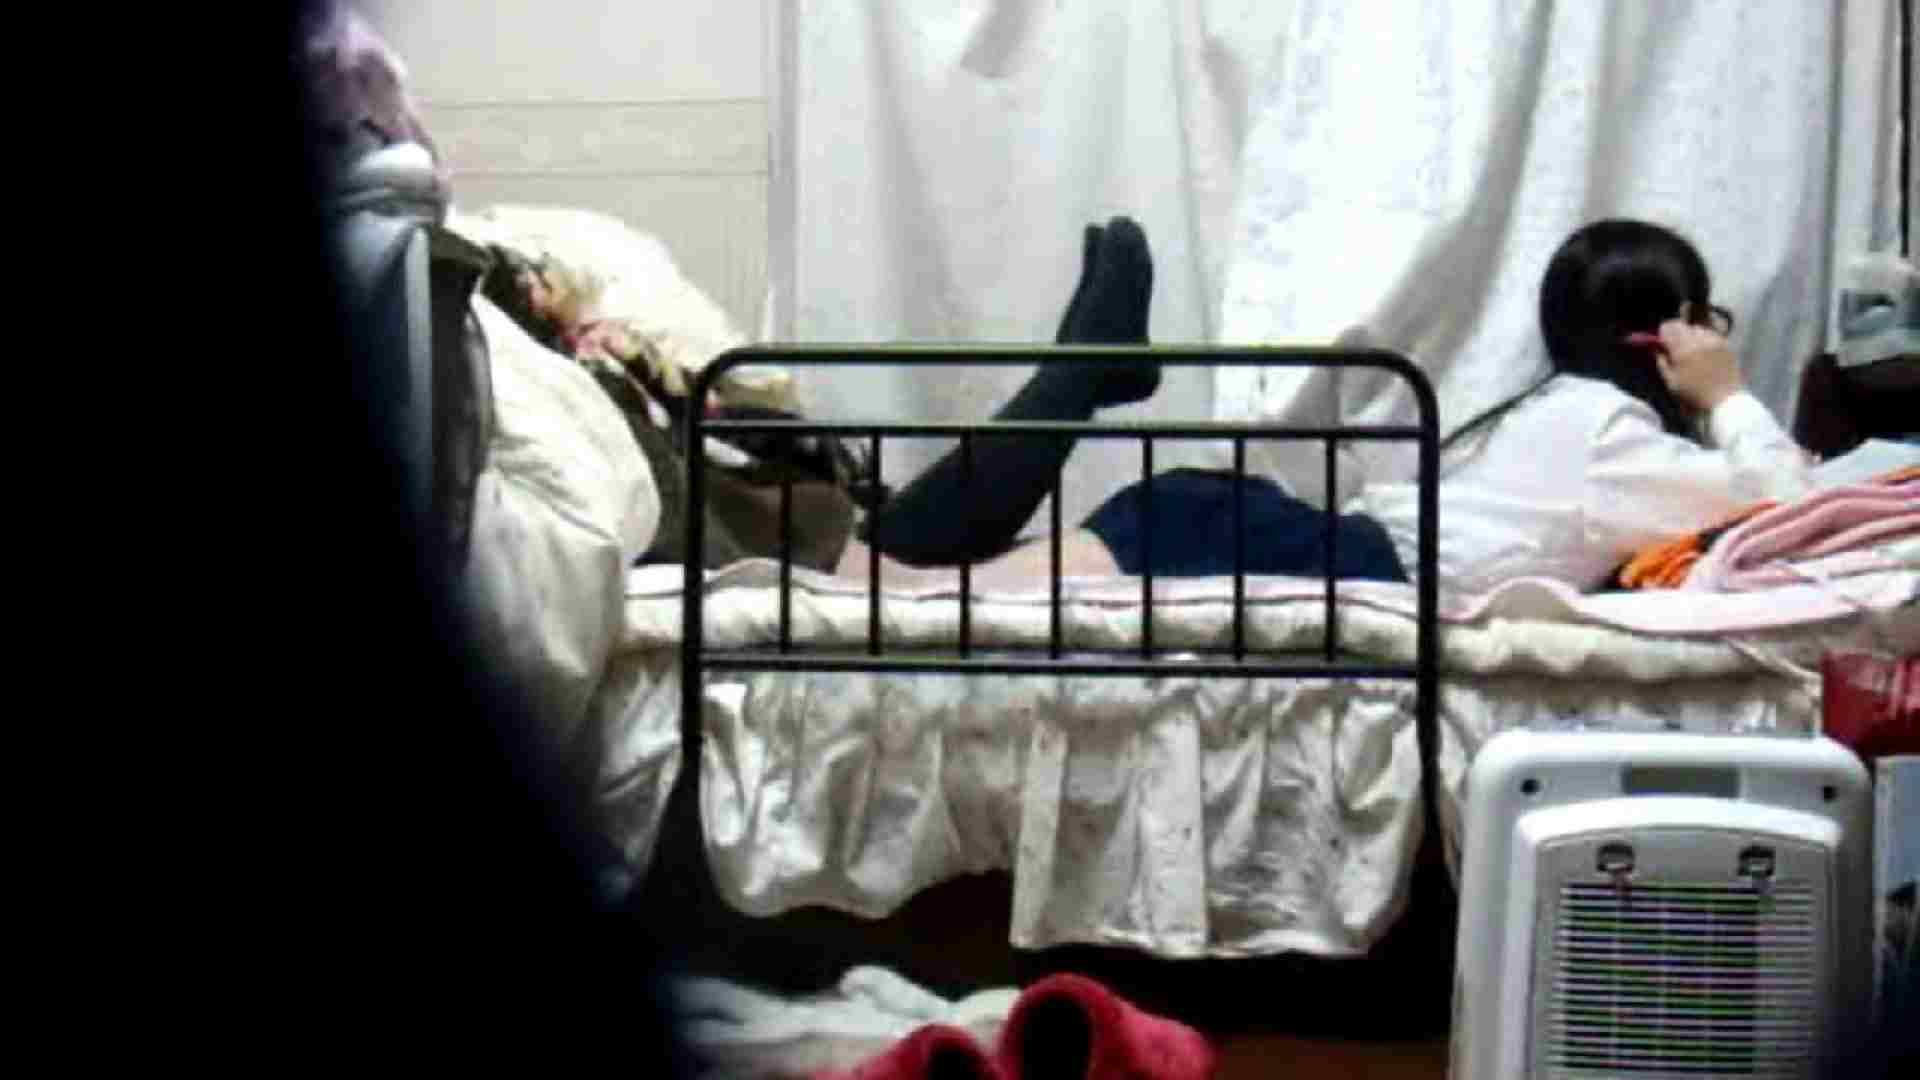 vol.4 まどかの帰宅後の部屋、ベッドで何かが始まります。 ○族 ヌード画像 100画像 23